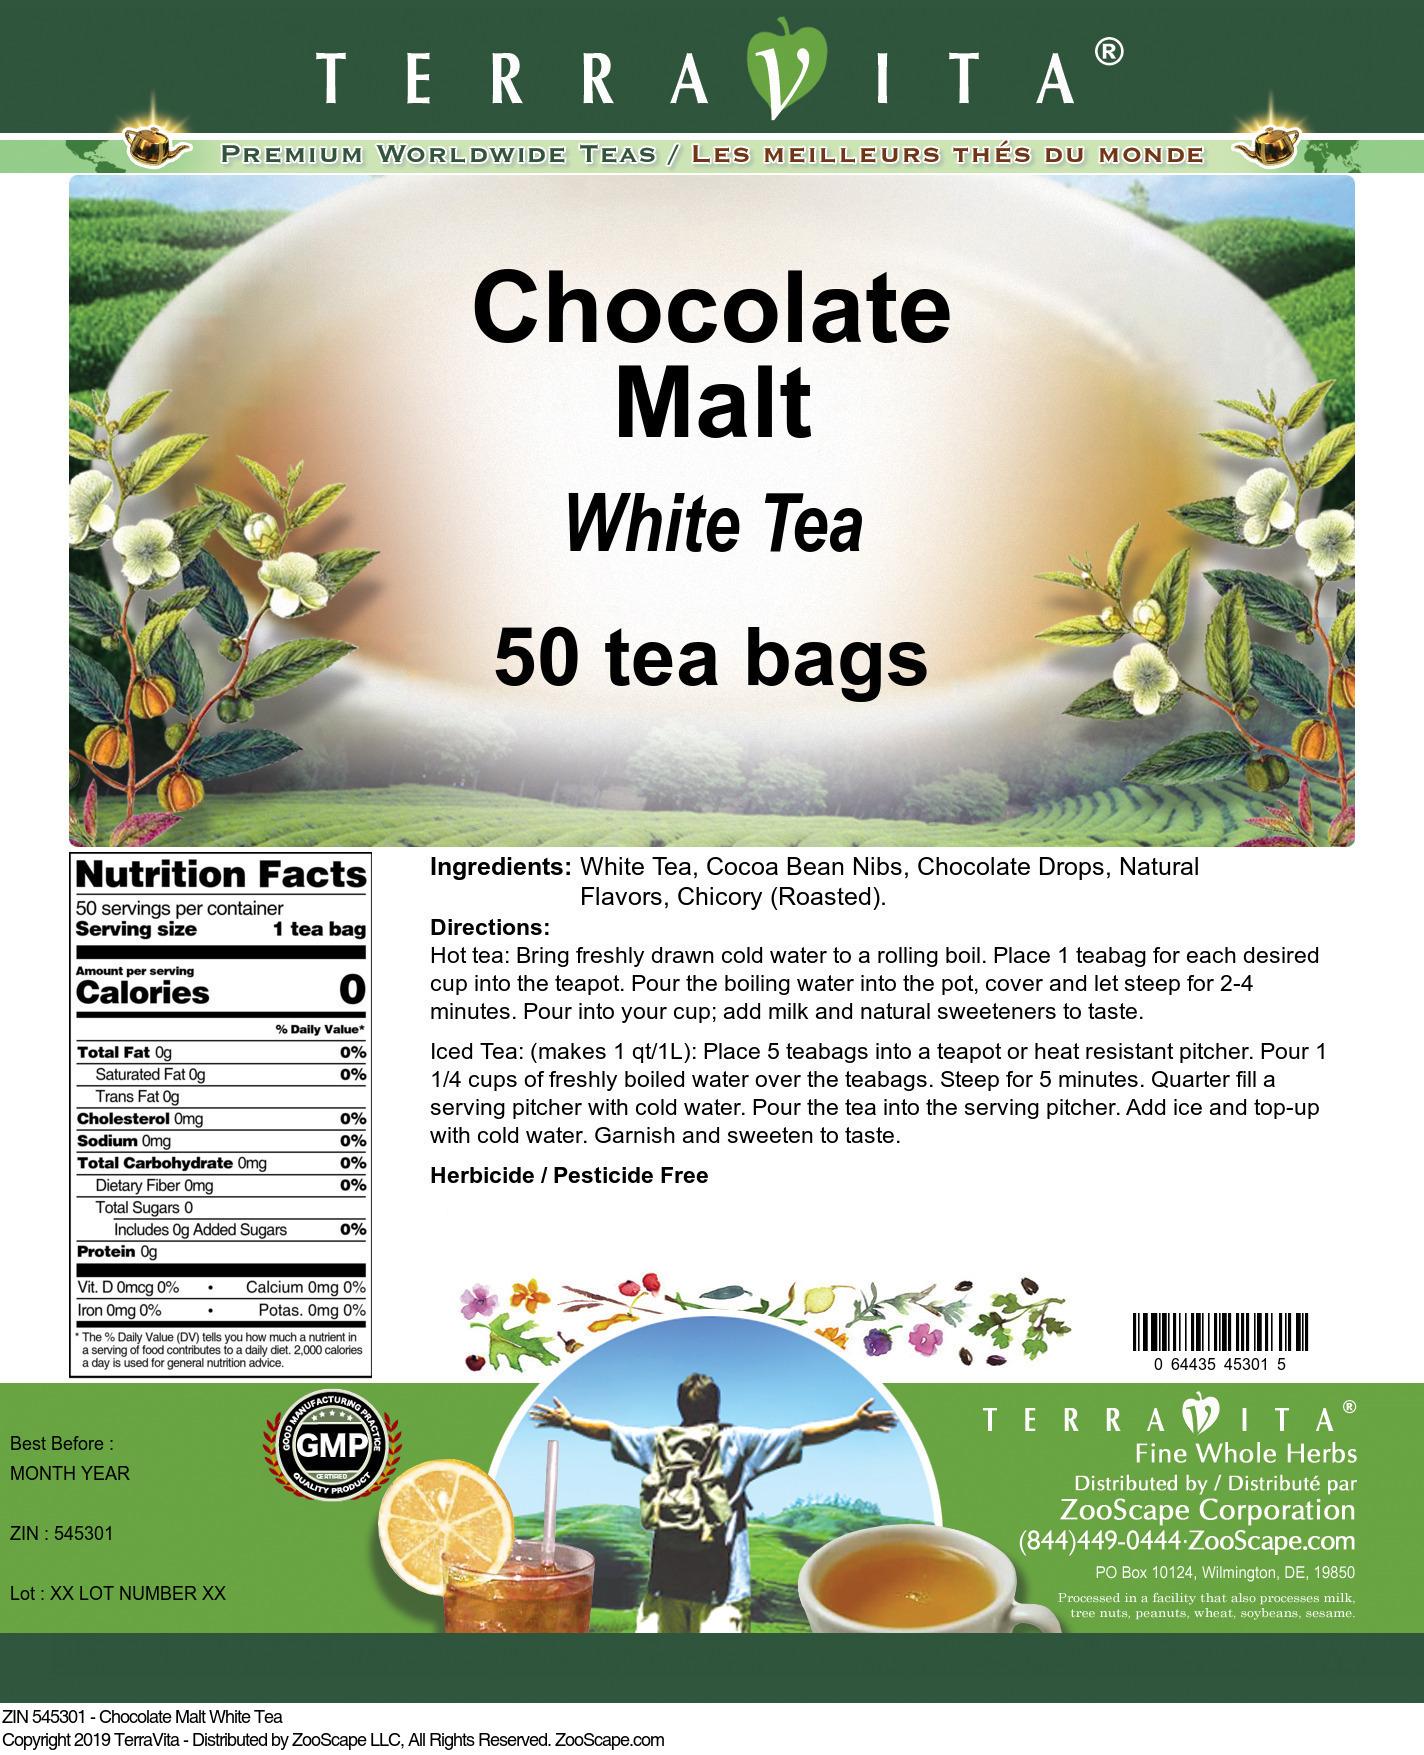 Chocolate Malt White Tea